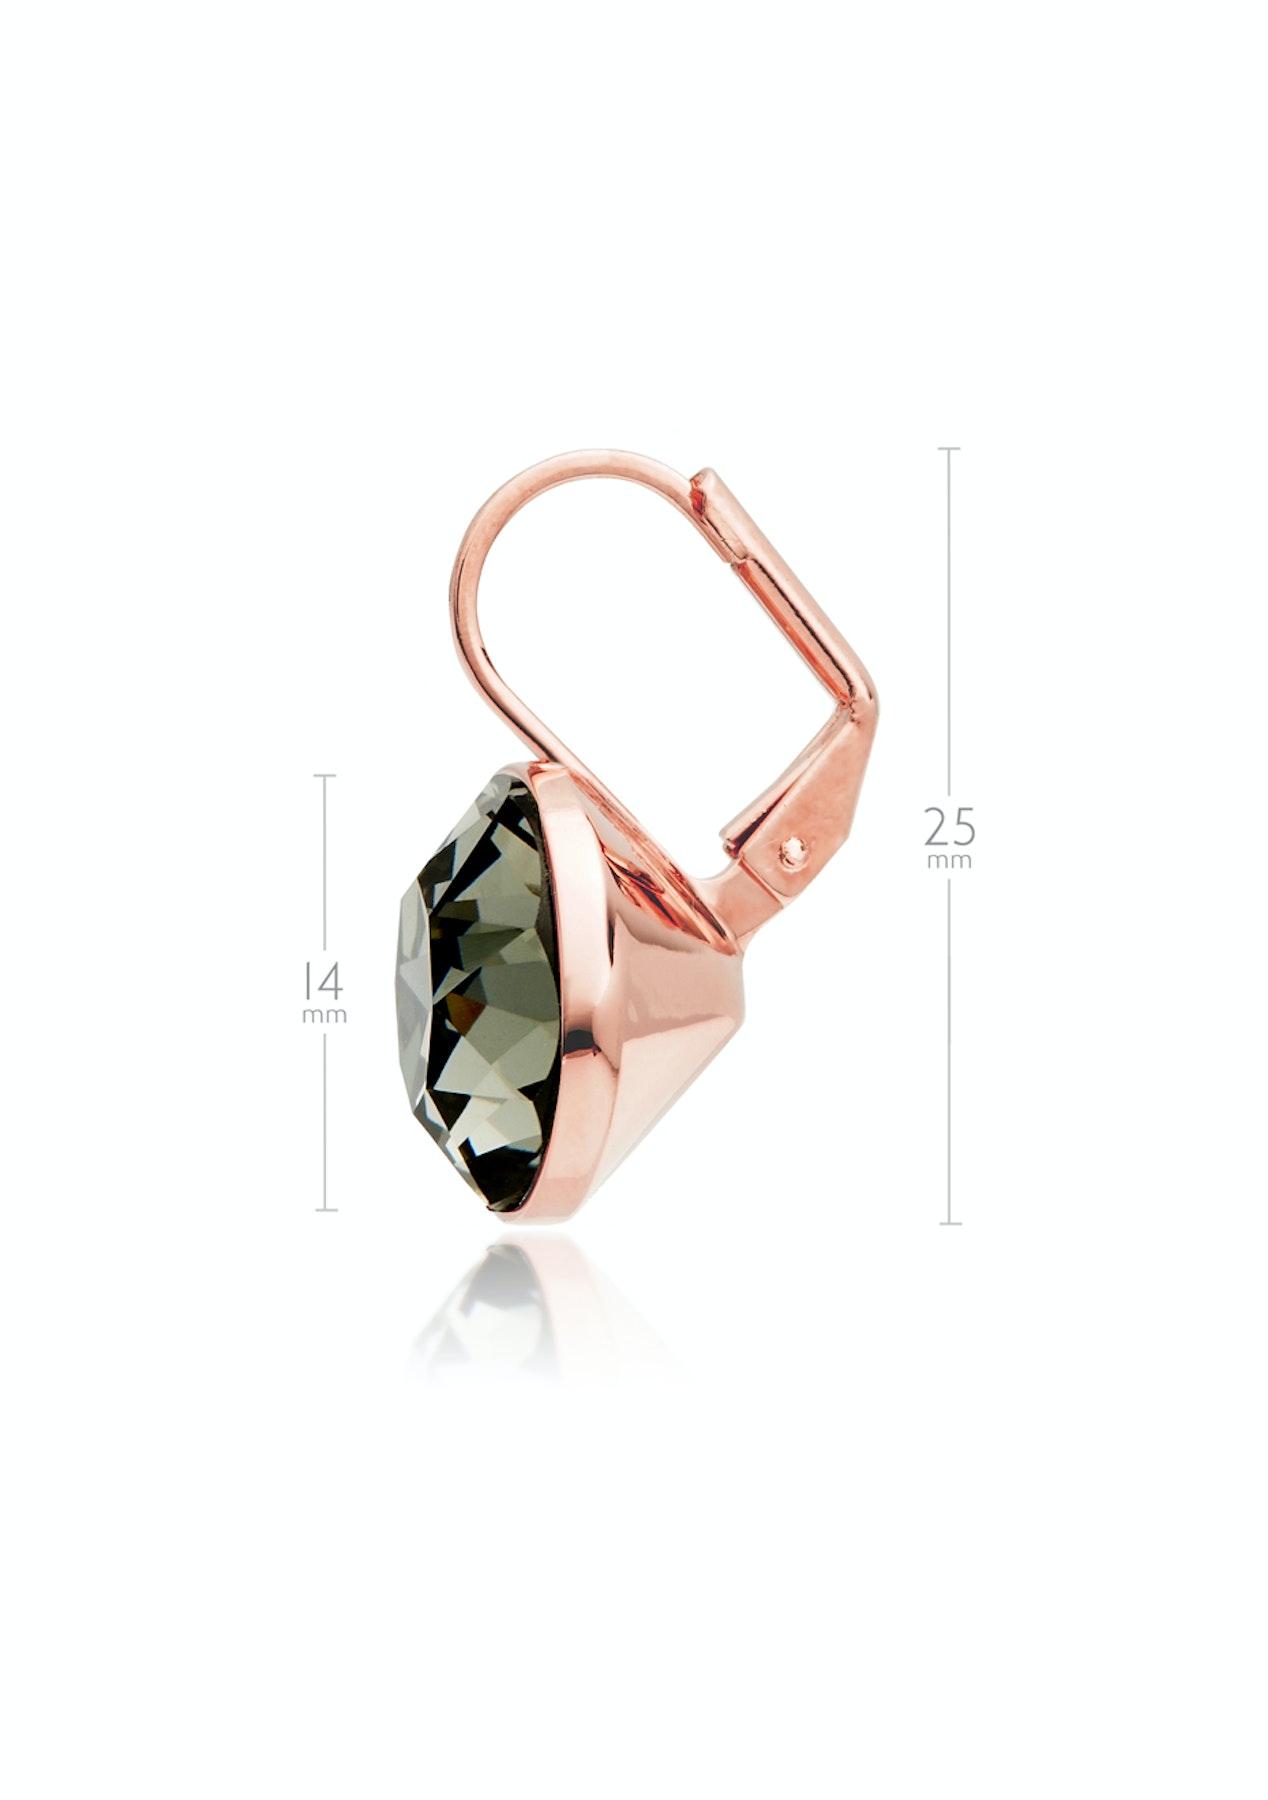 c93935961 Krystal Cotoure - Bella Earrings with 8.5 Carat Swarovski Black Diamond  Crystals Rose Gold Plated - My Jewellery Store Swarovski Elements Jewellery  Under ...